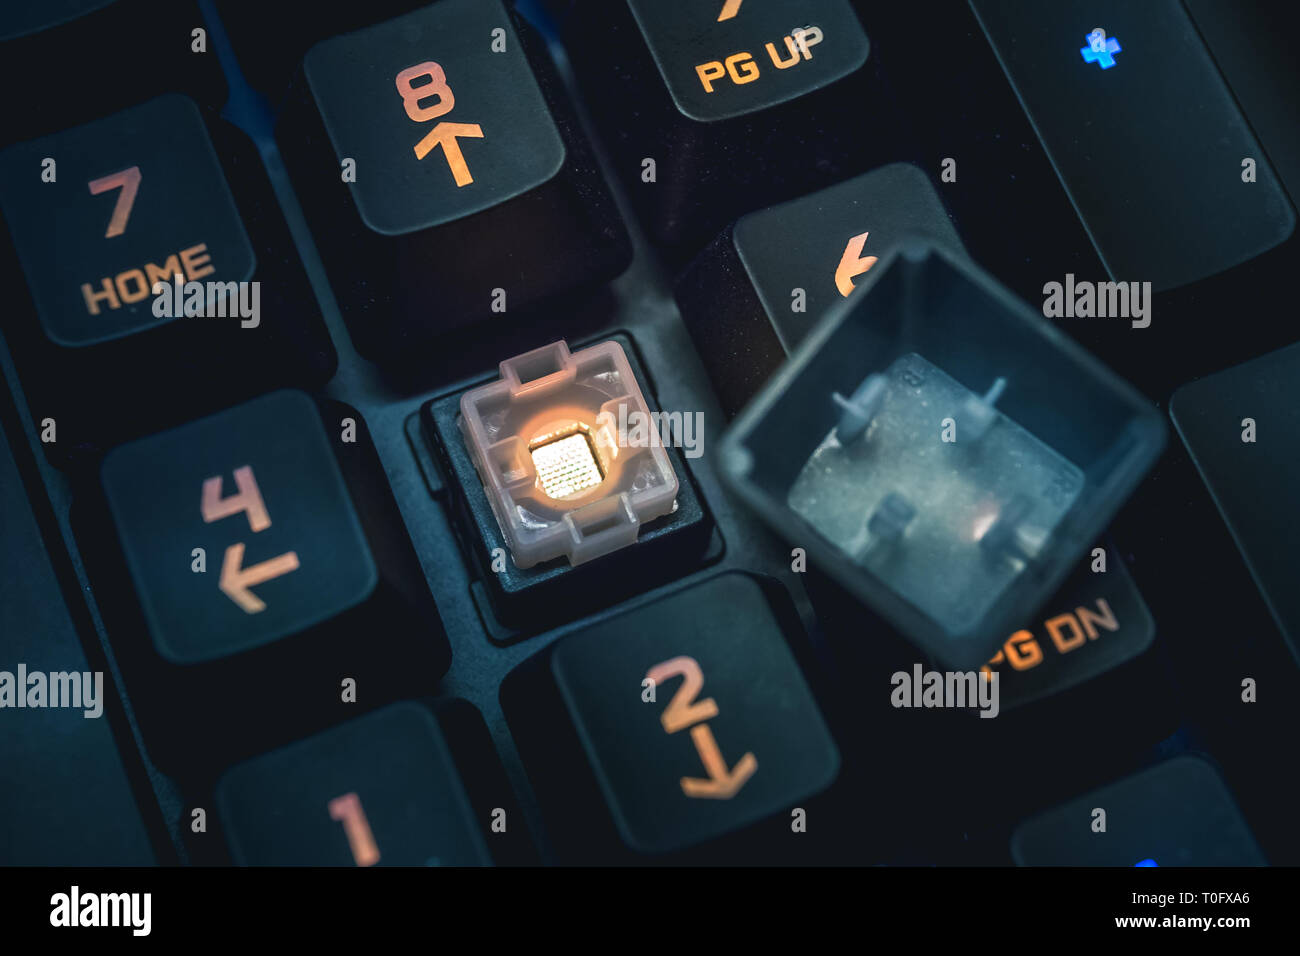 Romer-G backlit mechanical keyboard numerical buttons detail shot. - Stock Image